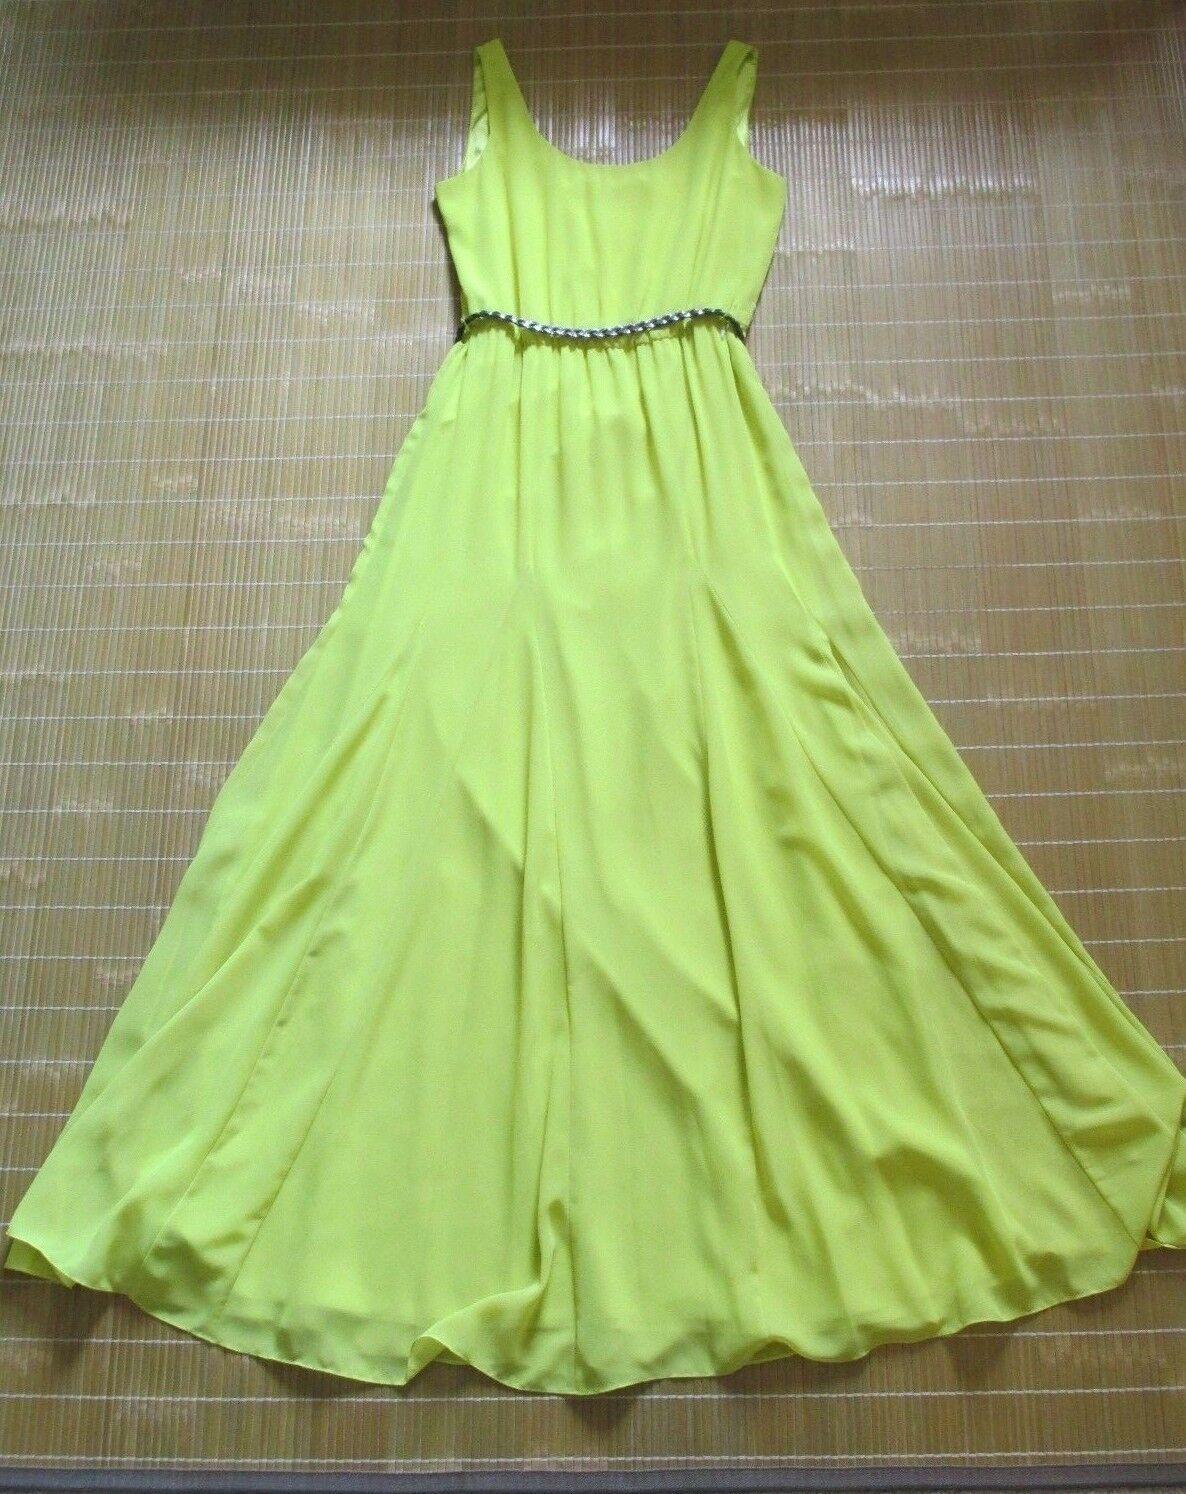 Gianni Bini Kiwi Farbe Long Dress (Größe S)